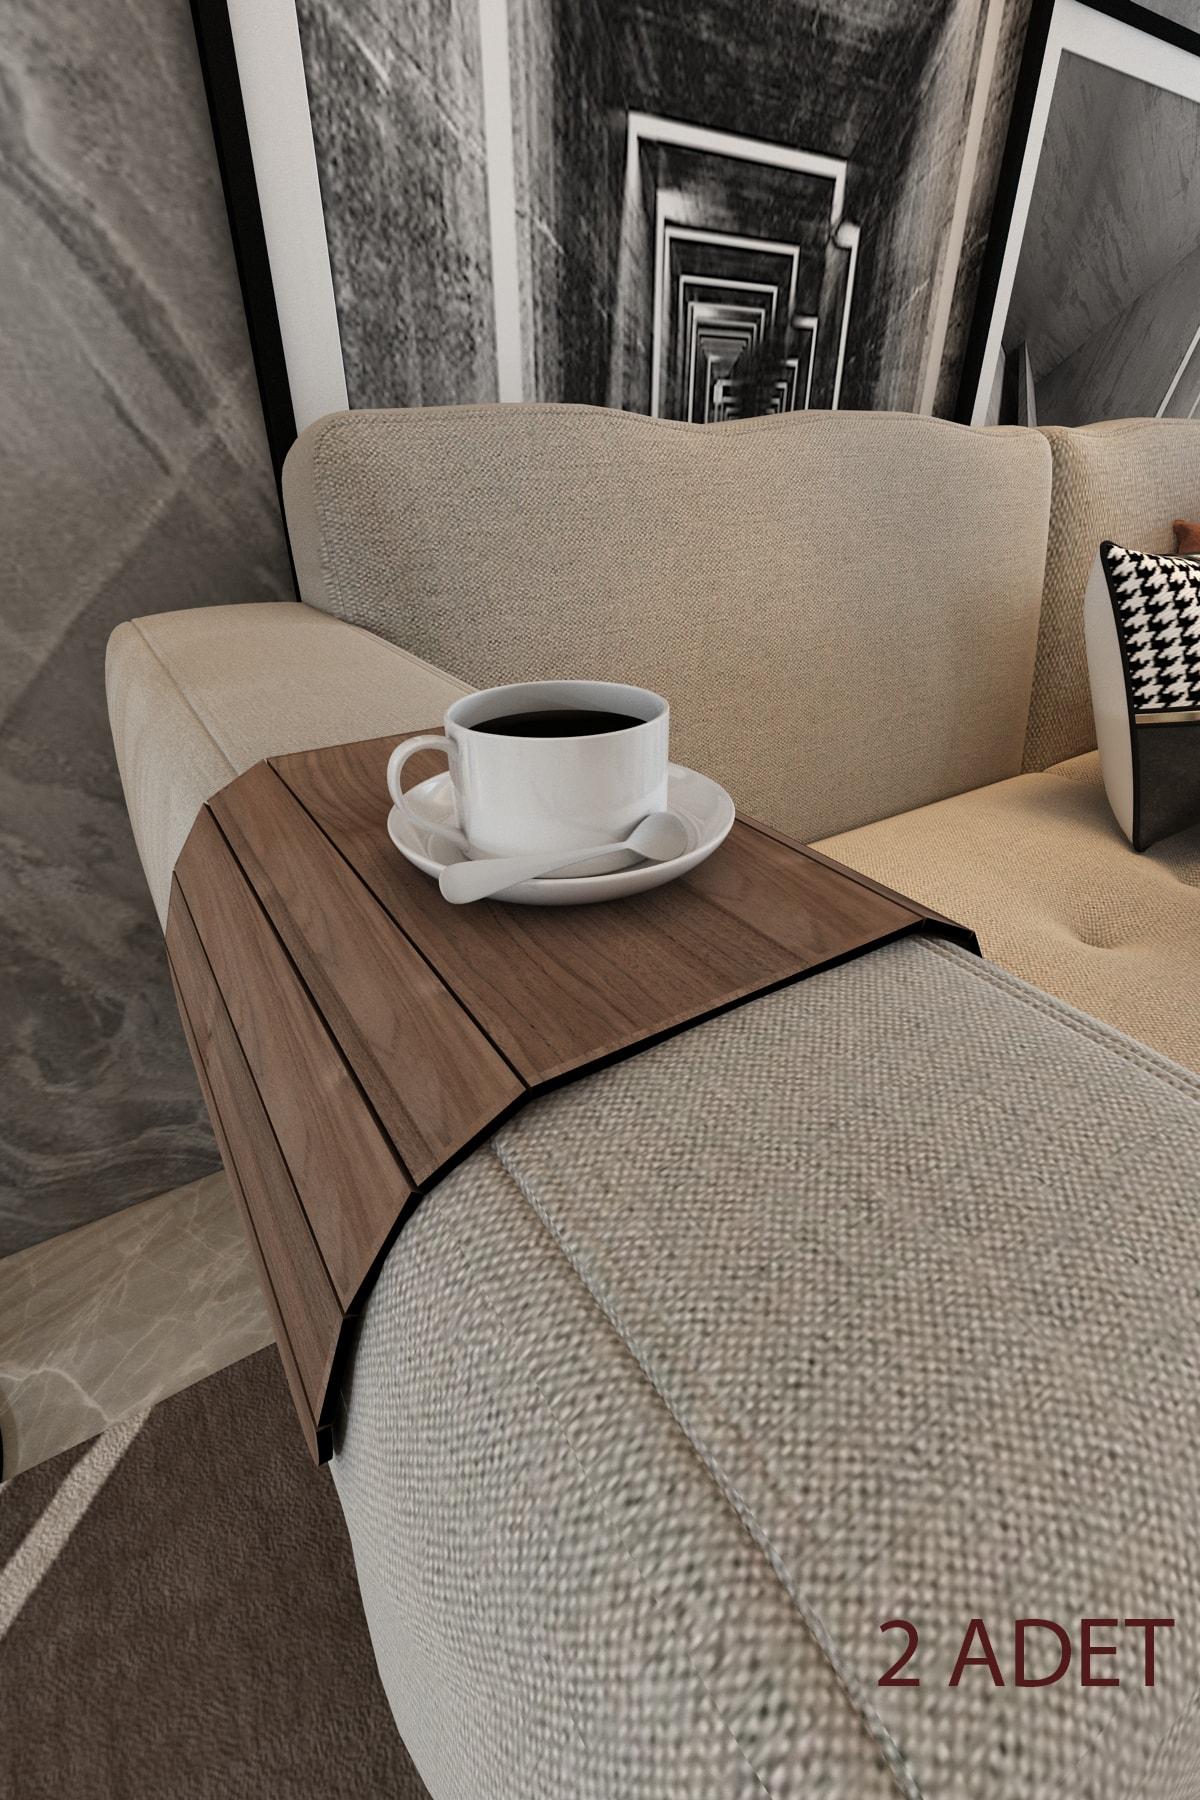 Koyu Kahve Koltuk Tepsisi 2 Adet Yan Sehpa Tesbih Cevizi 25x45 Cm Ortasabit 15,8 Cm Amerikan Servisi